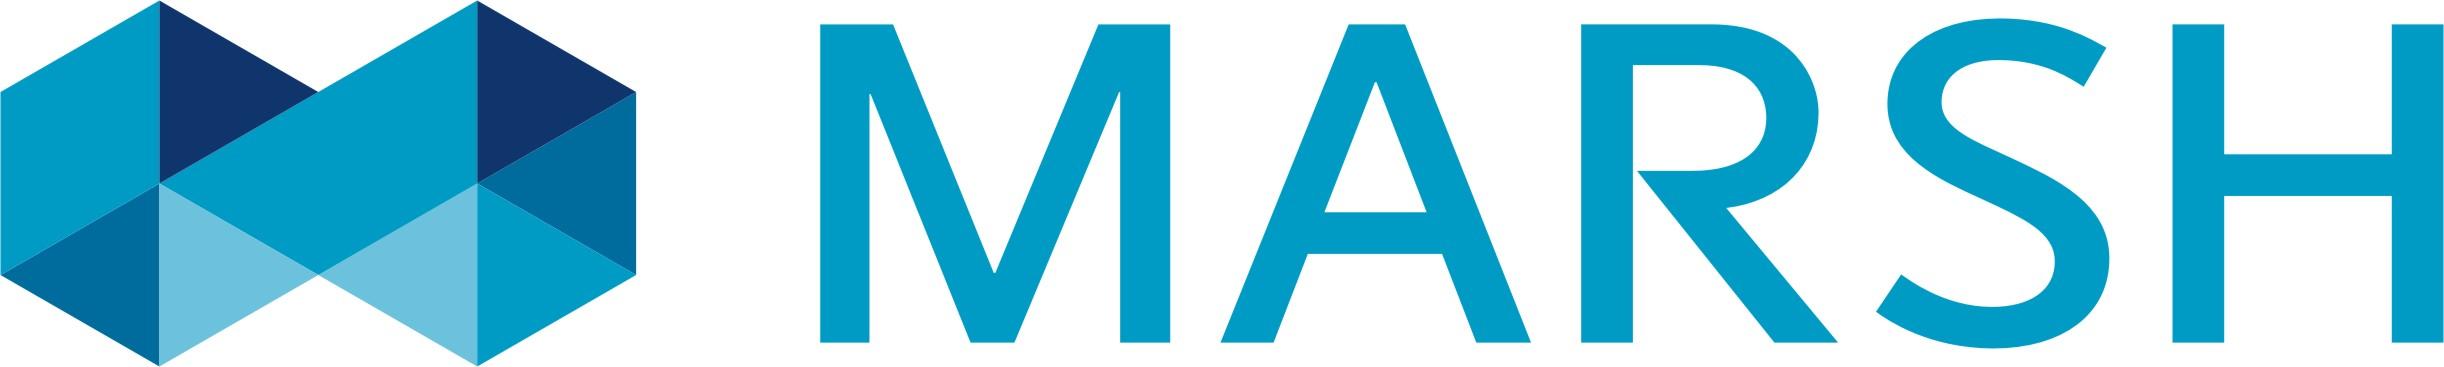 104108_logo_MARSH_horizontal_4c